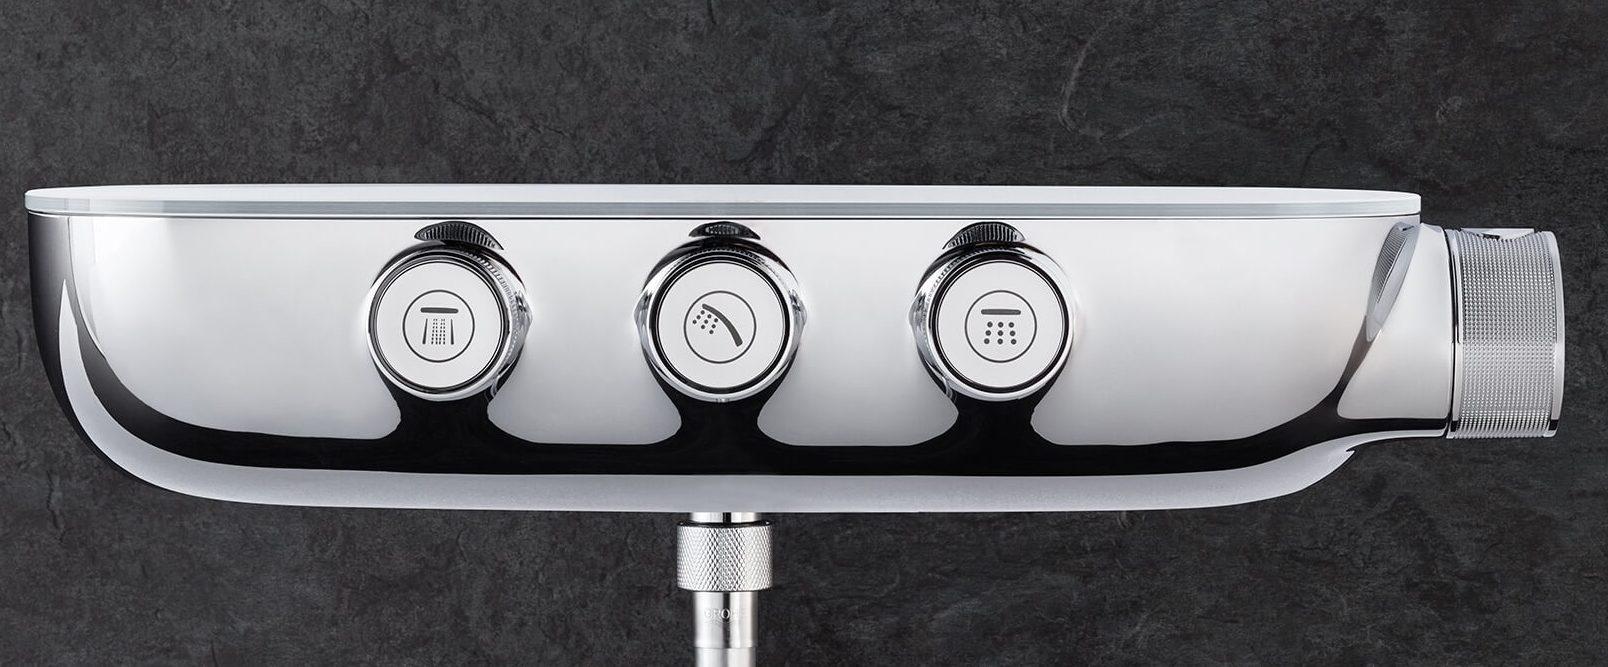 Thermostatarmatur mit verchromtem Zinkdruckgussgehäuse